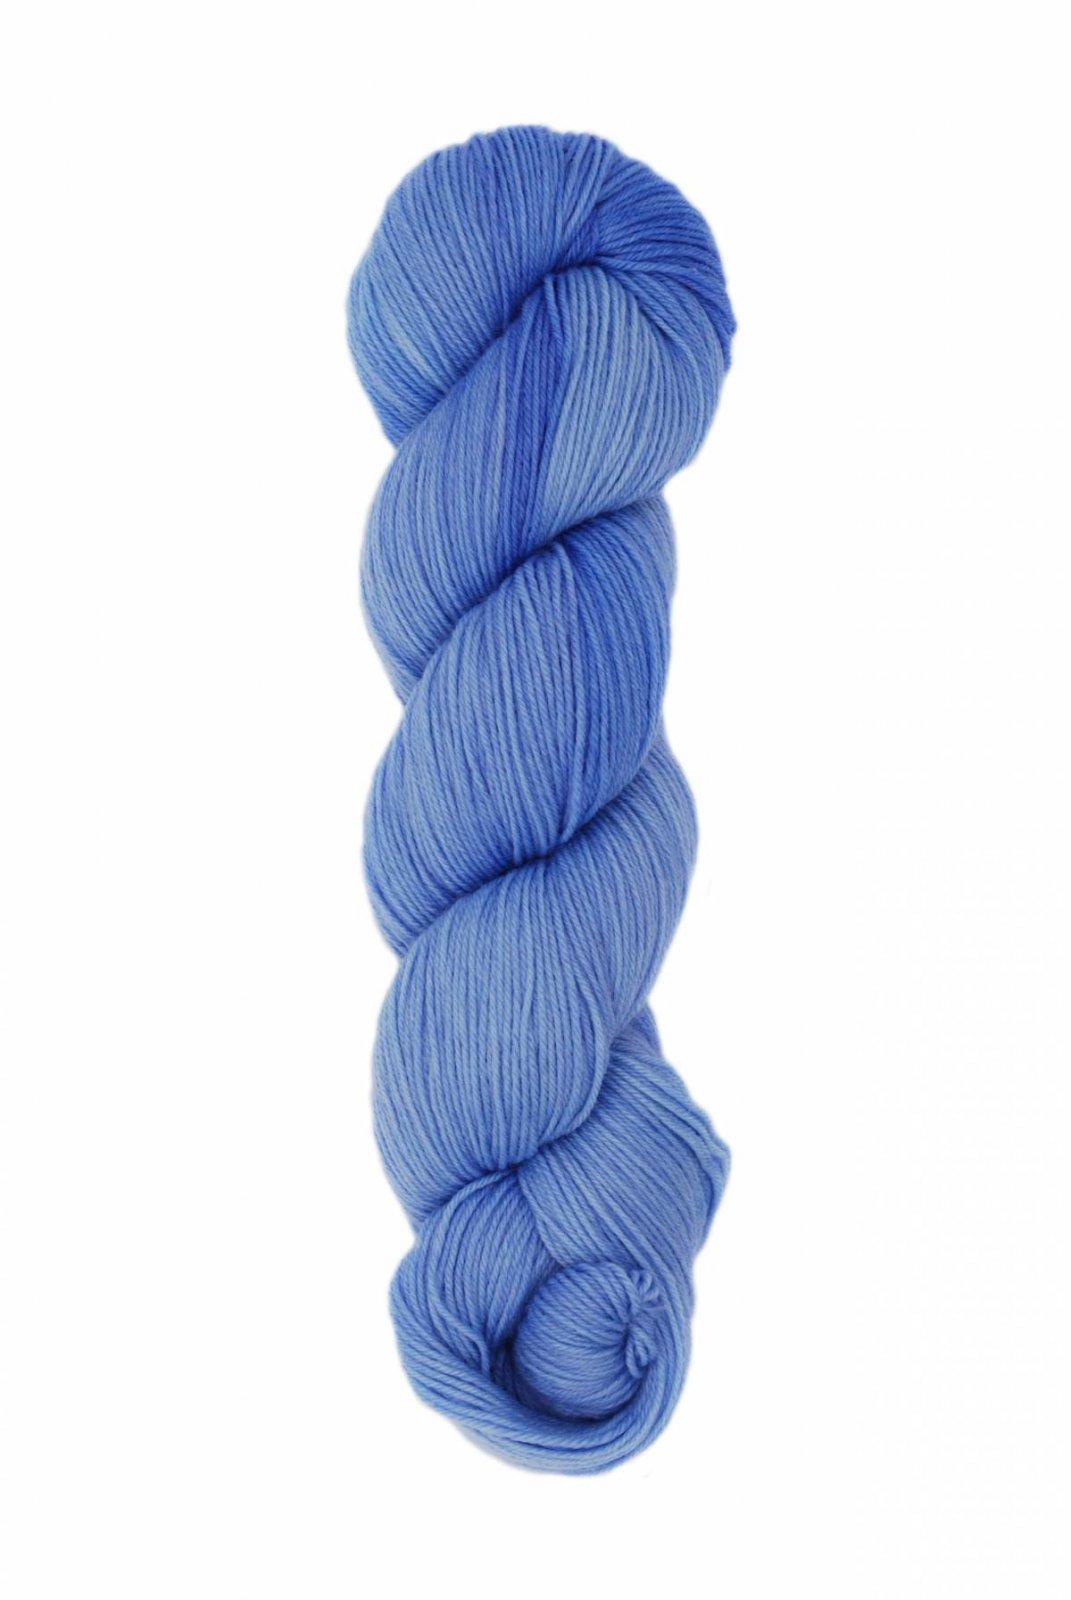 KFI Collection:  Indulgence Kettle Dyed:  1010 Sky